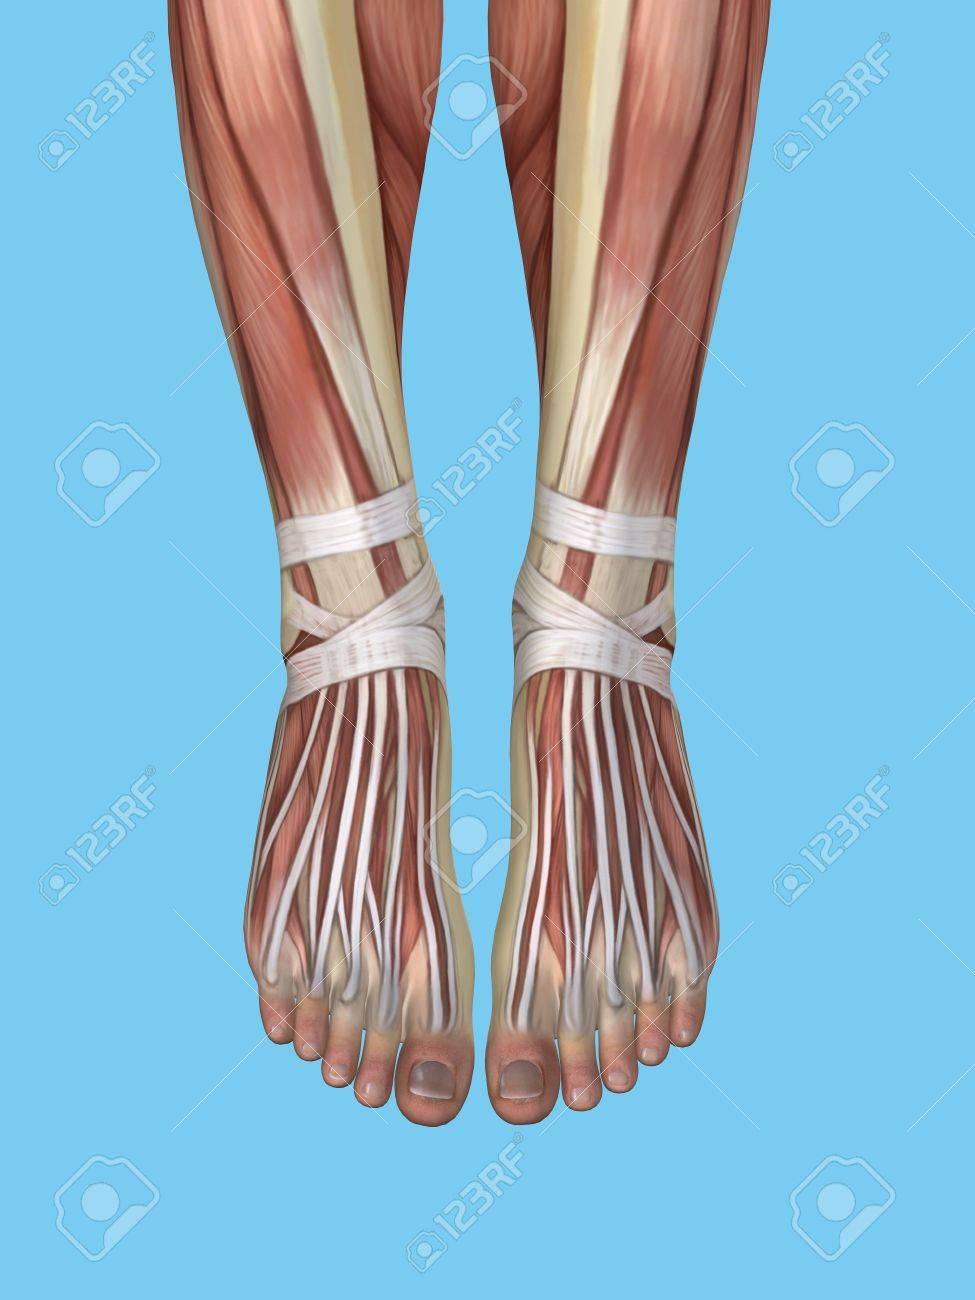 Anatomy Of Foot Featuring Extensor Digitorum Longus Tendons Stock